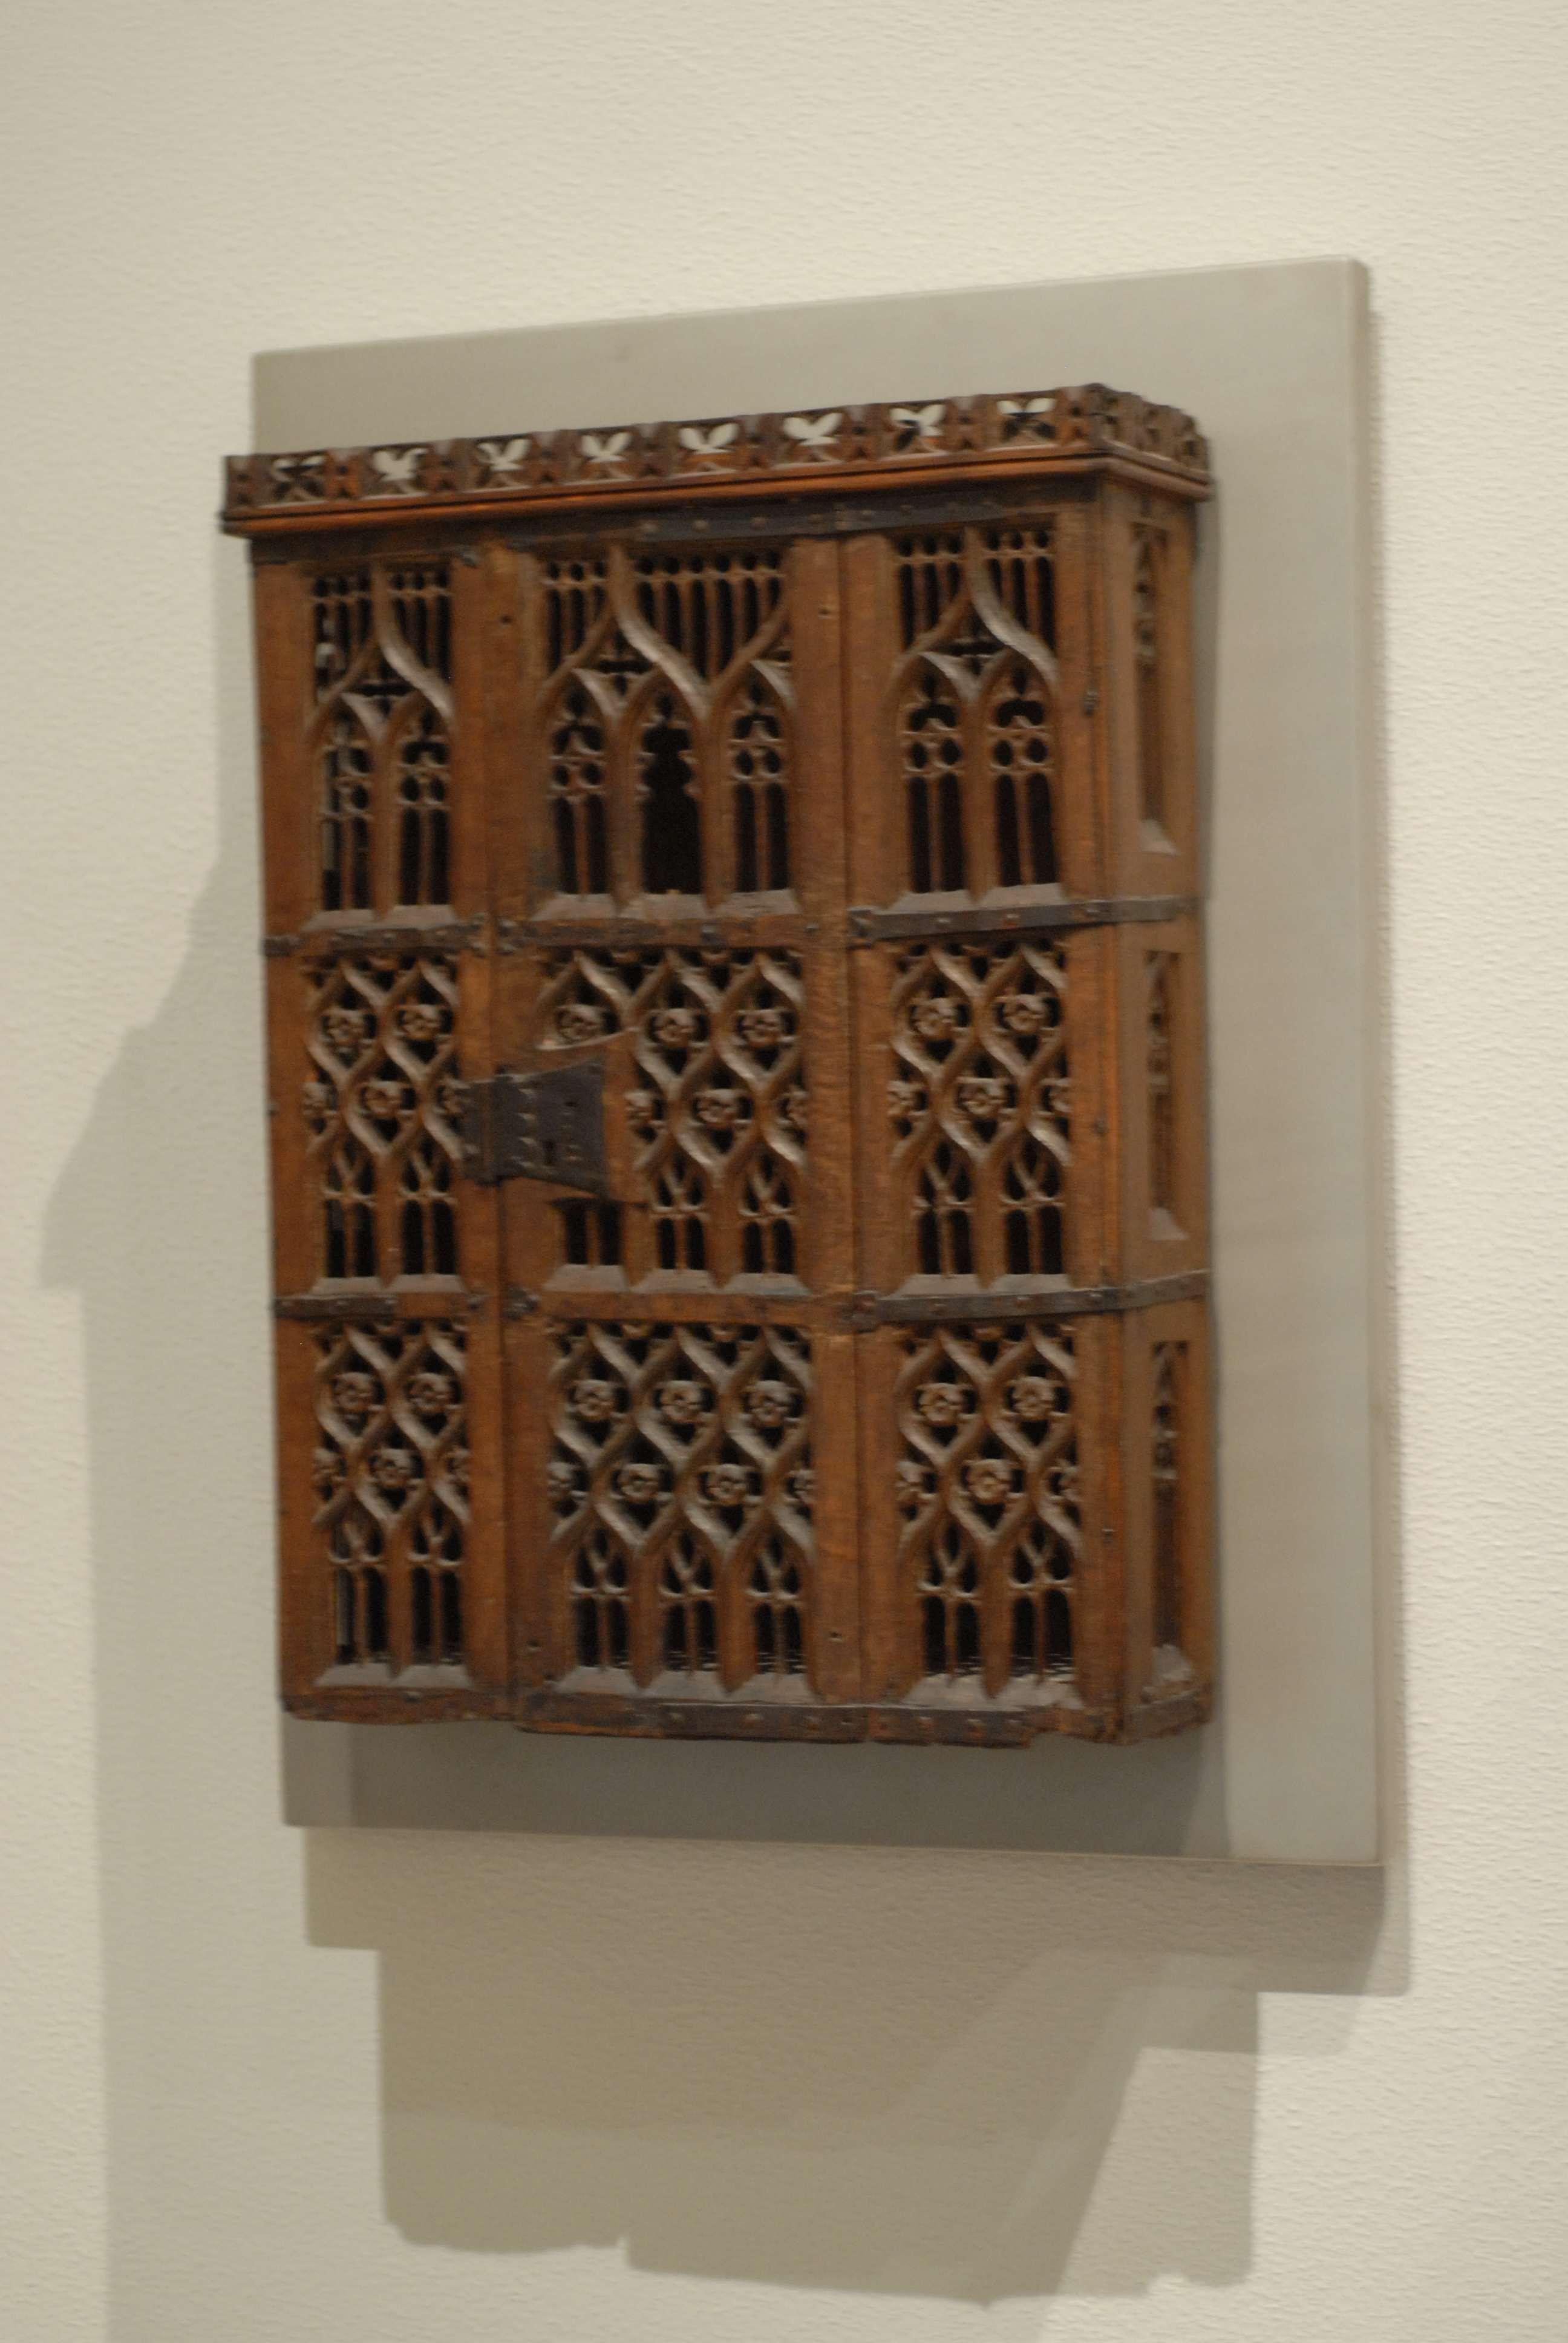 Hangeschrank Museum Fur Angewandte Kunst Koln Meble Architektura